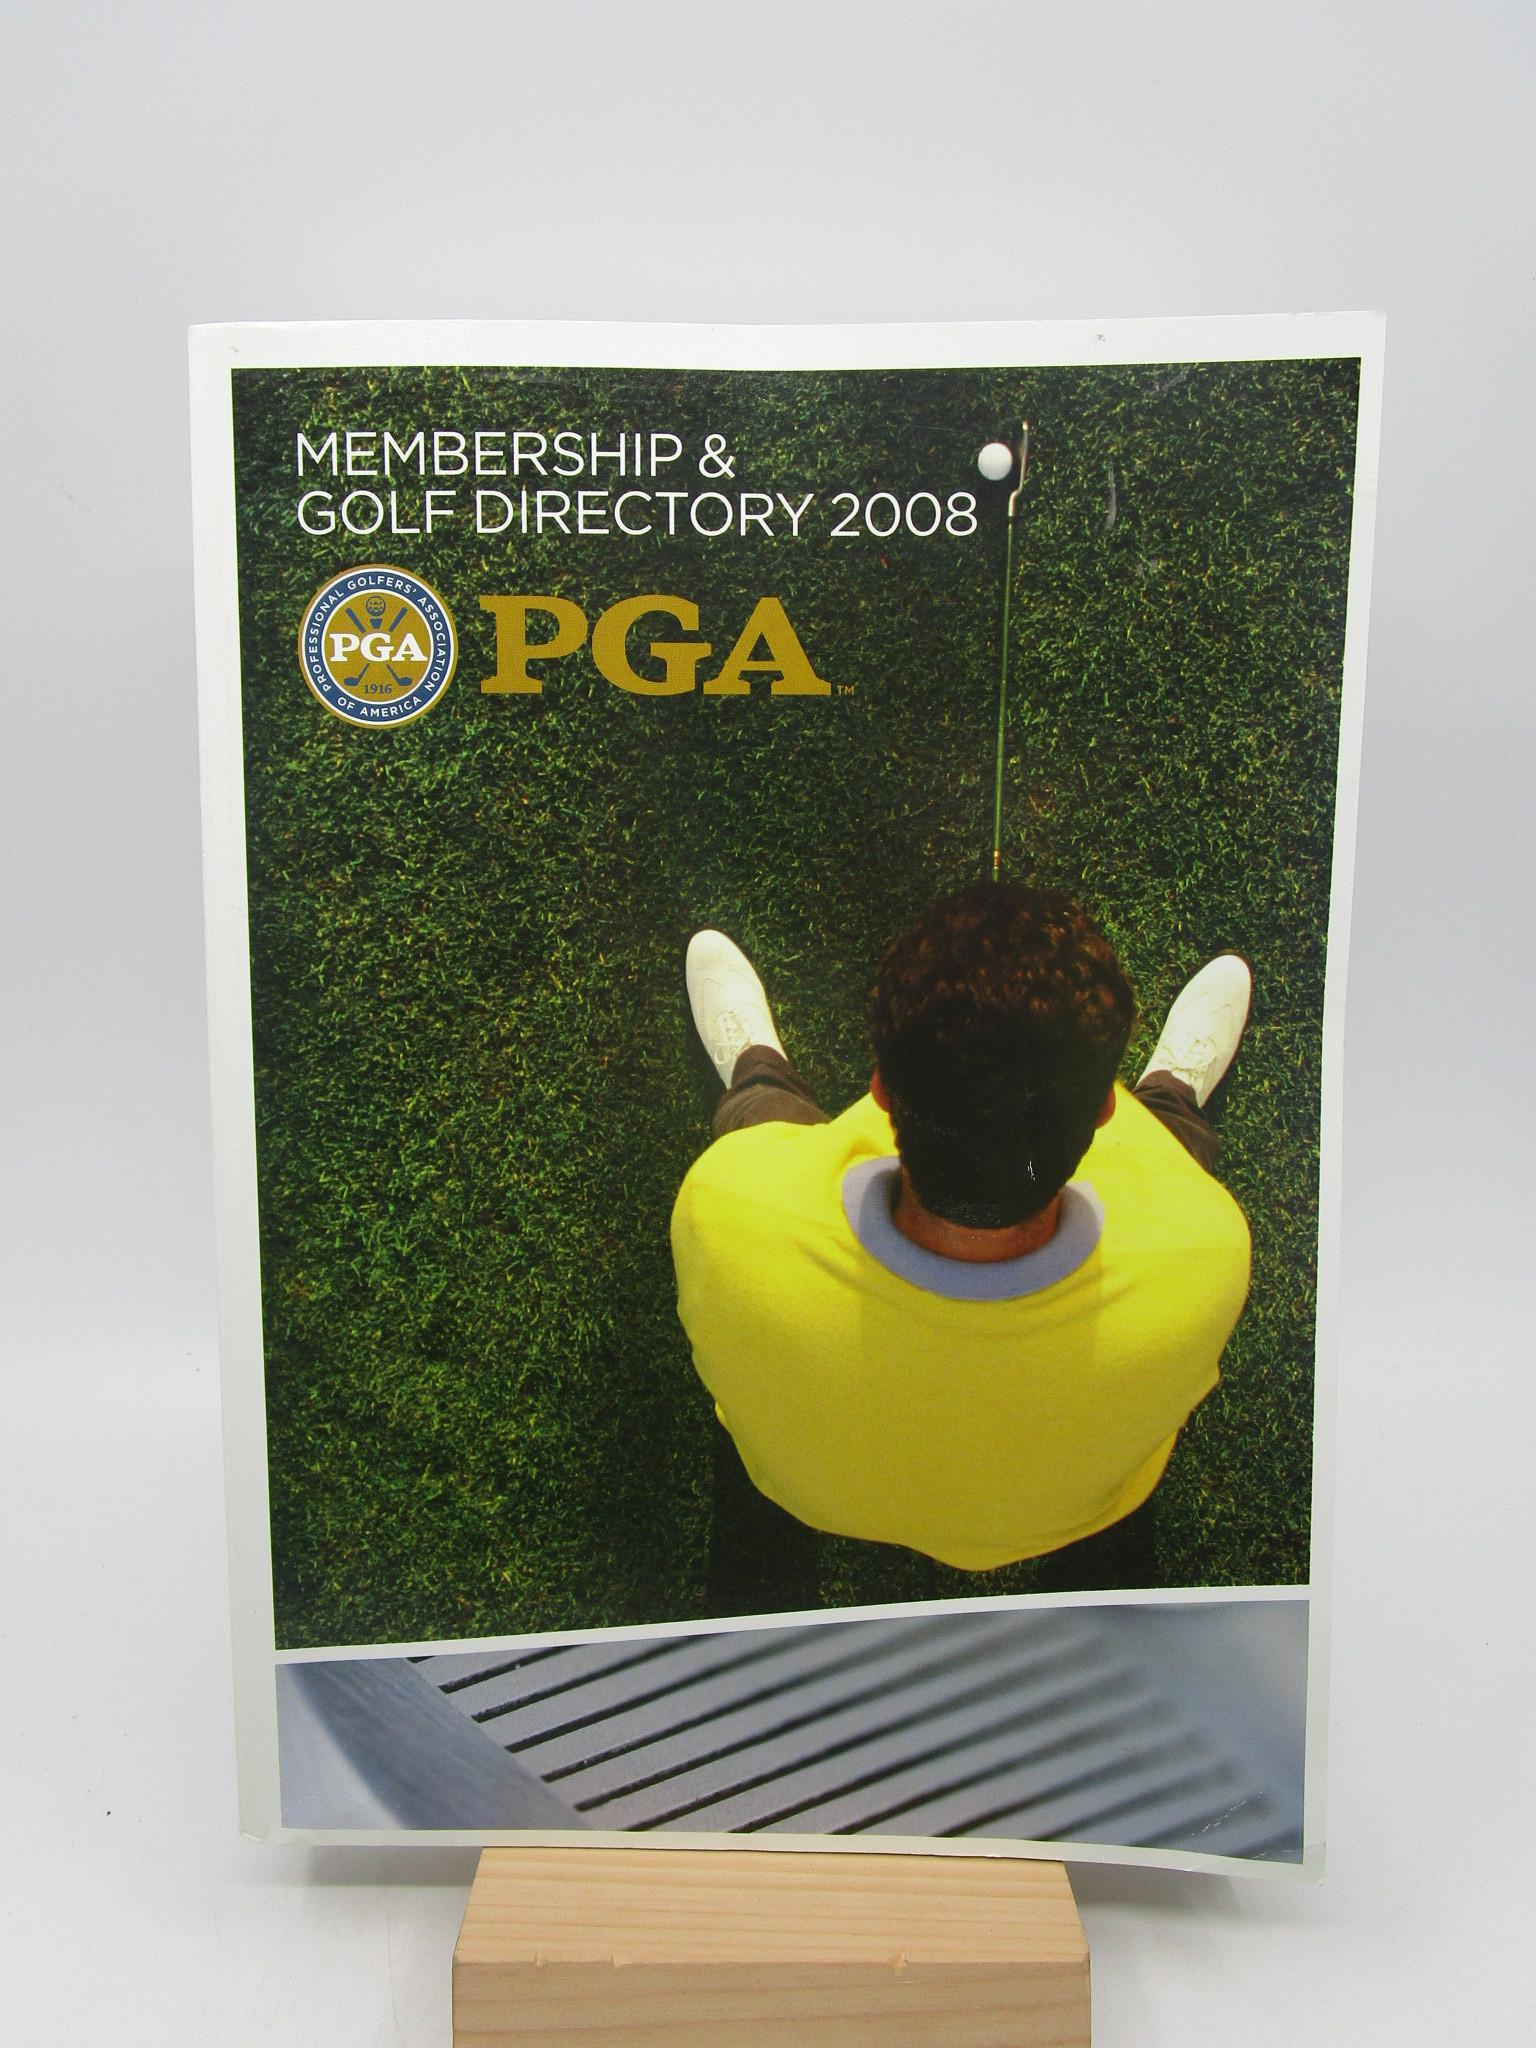 Image for PGA 2008 Membership and Golf Directory